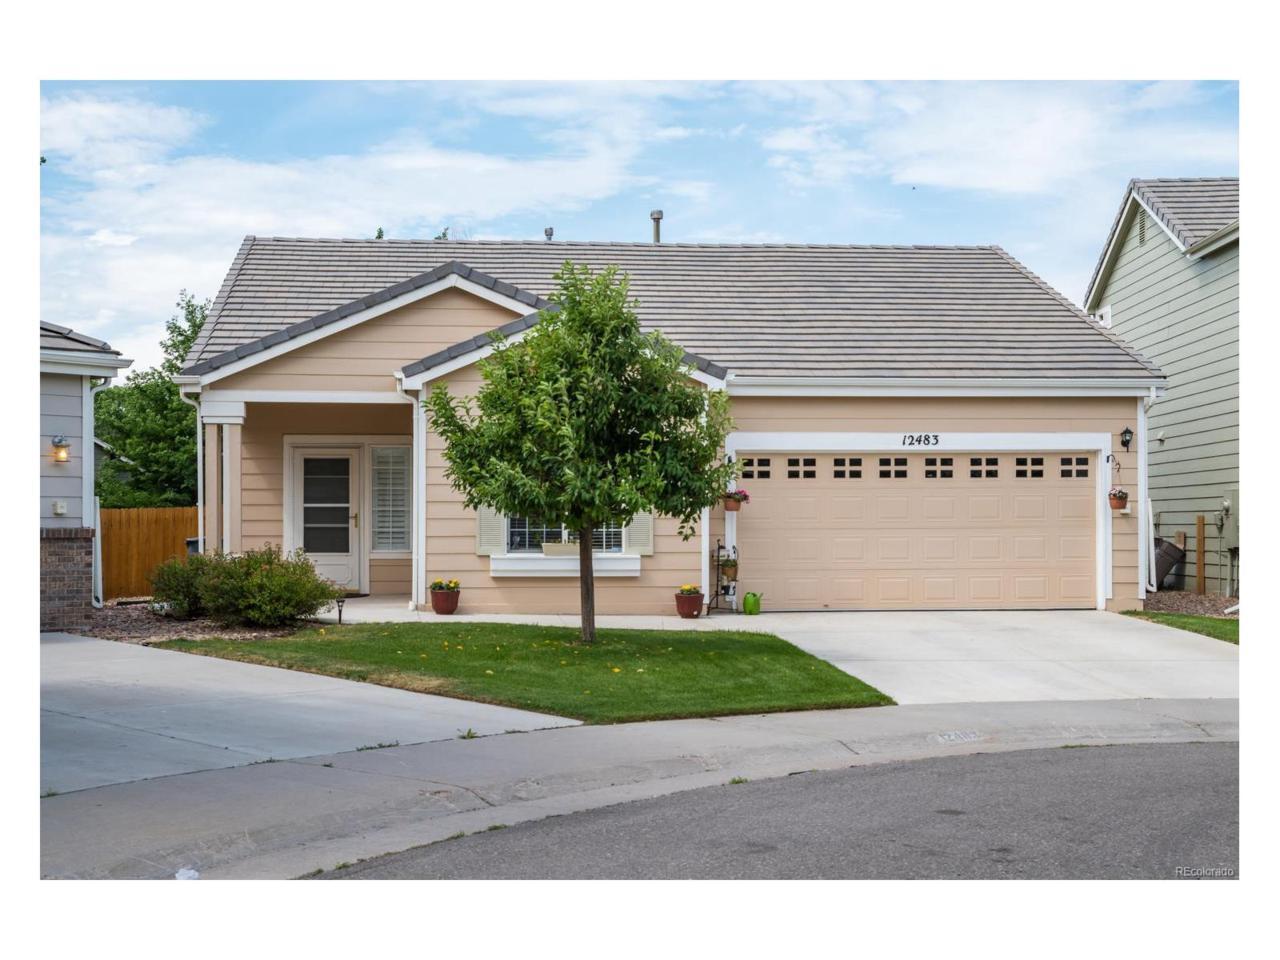 12483 S Bellisario Creek Court, Parker, CO 80134 (MLS #8390563) :: 8z Real Estate